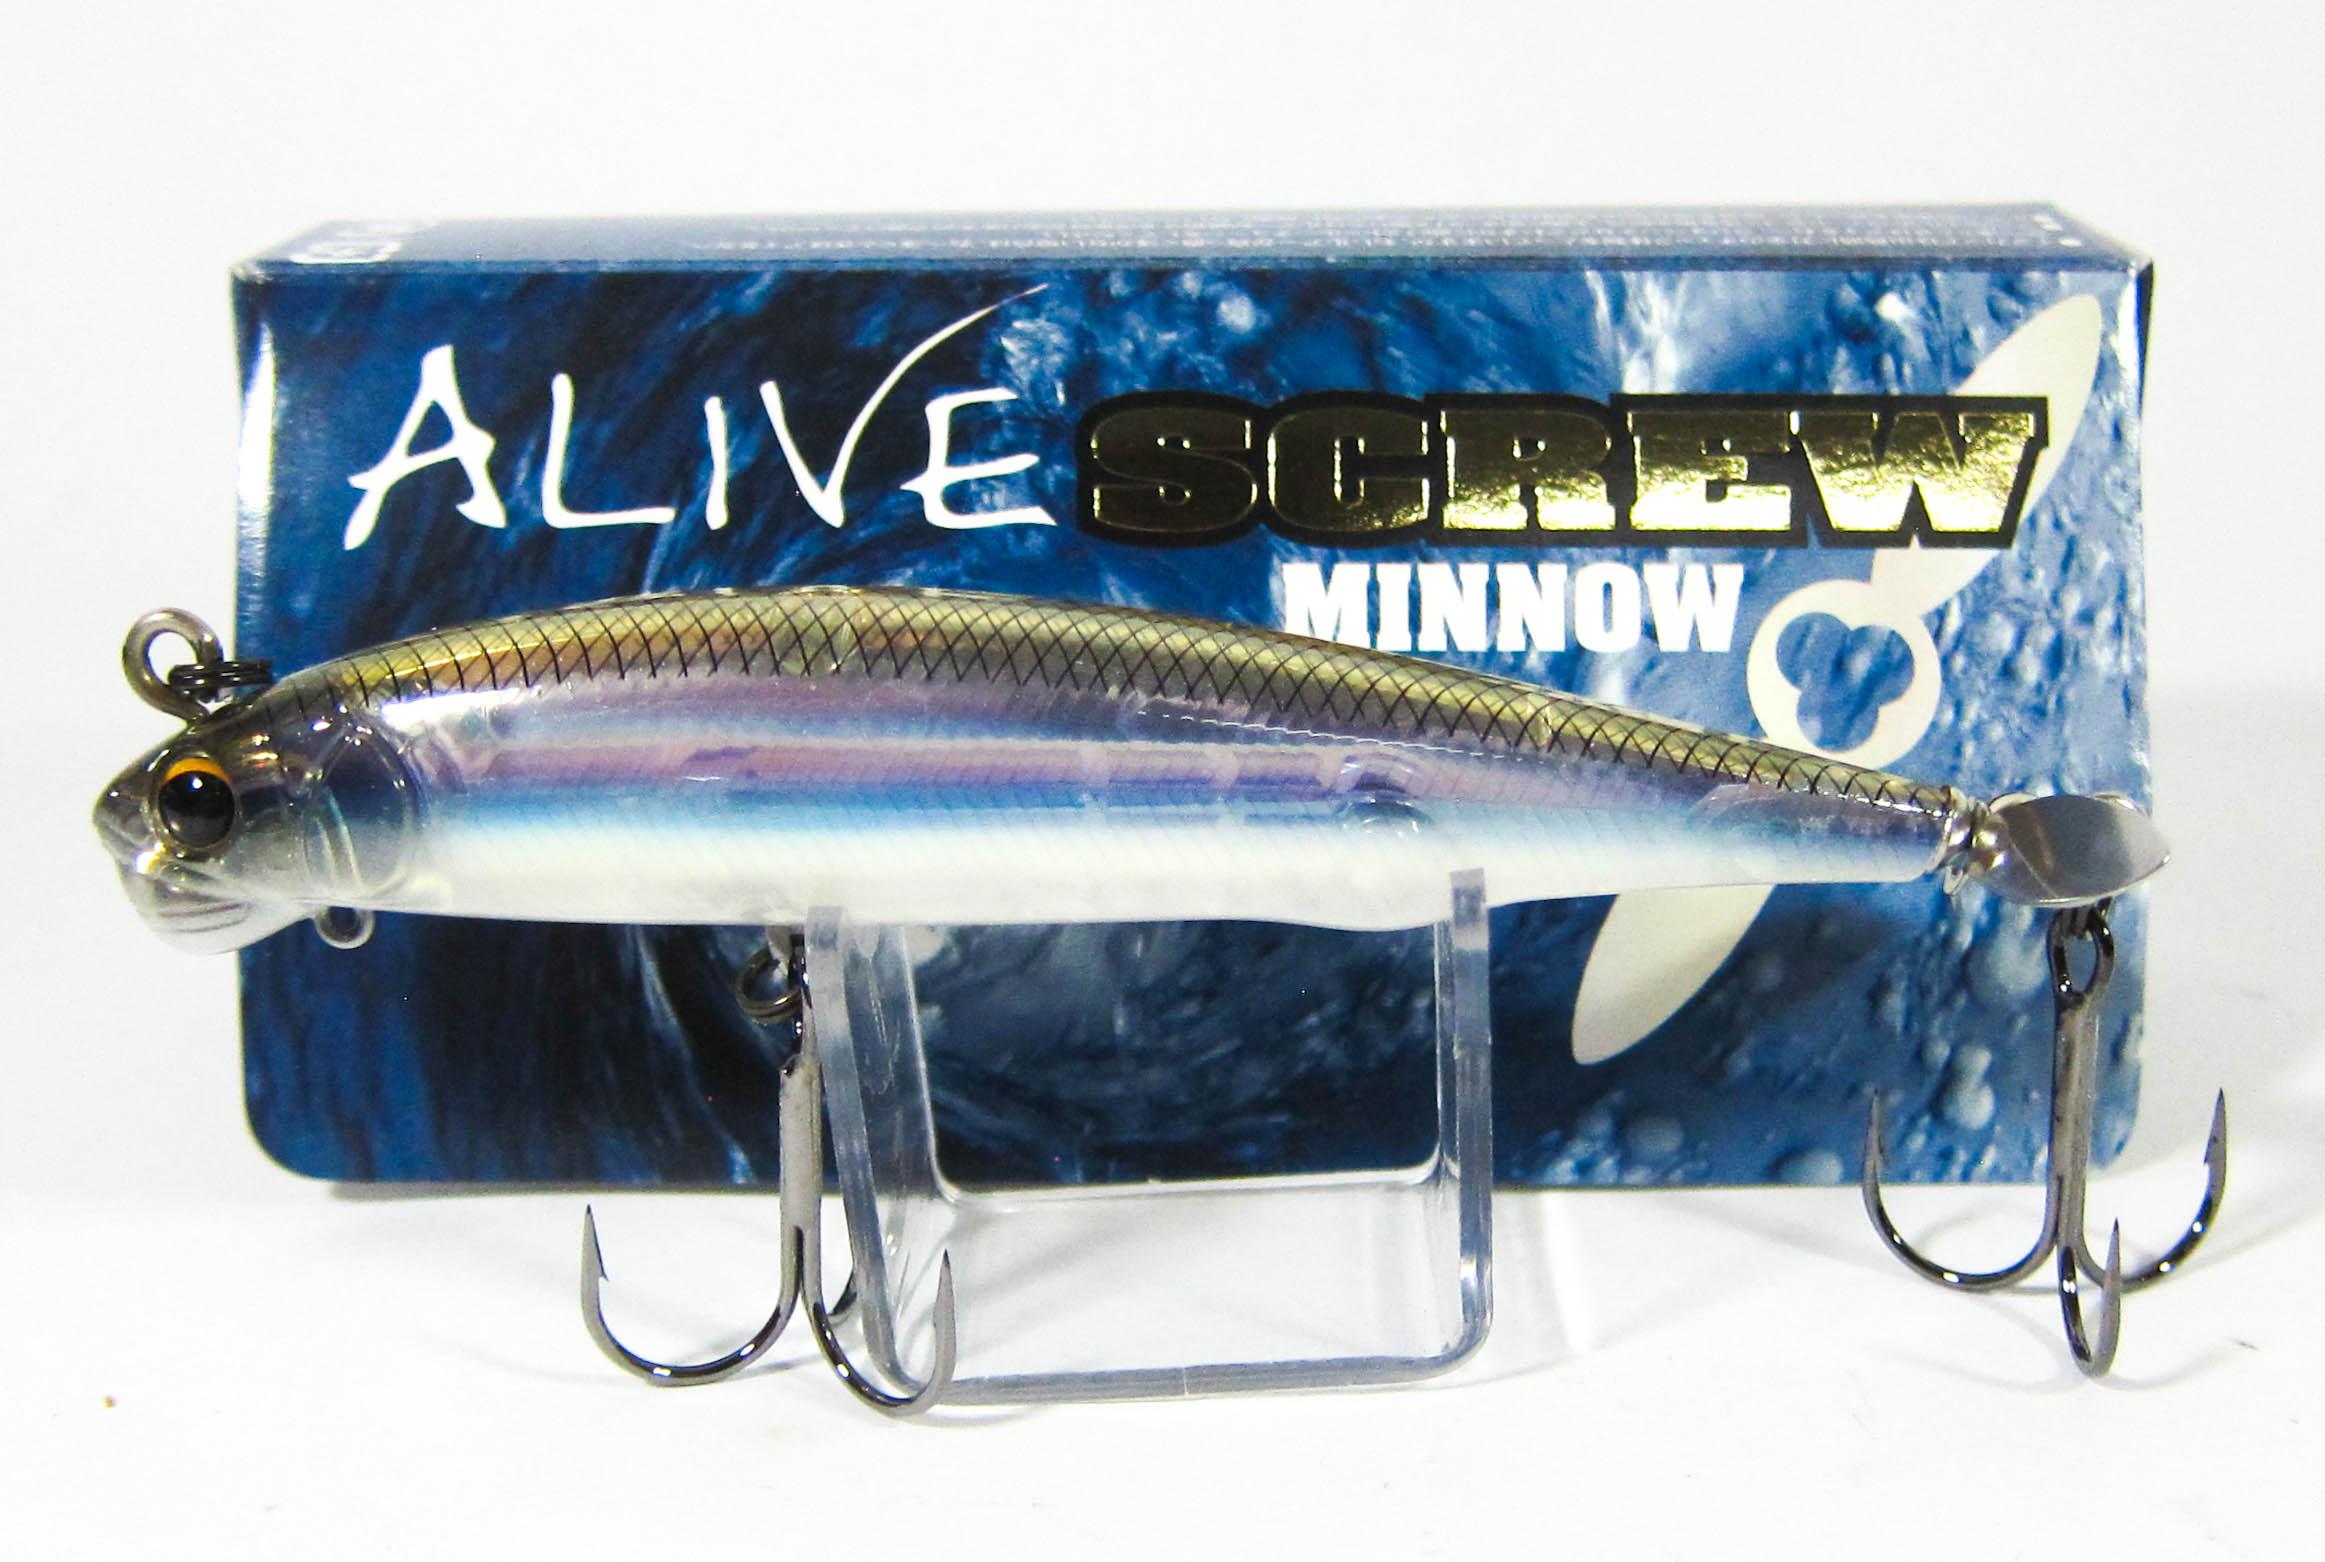 Imakatsu Alive Screw Minnow 90 Sinking Lure 201 (2926)